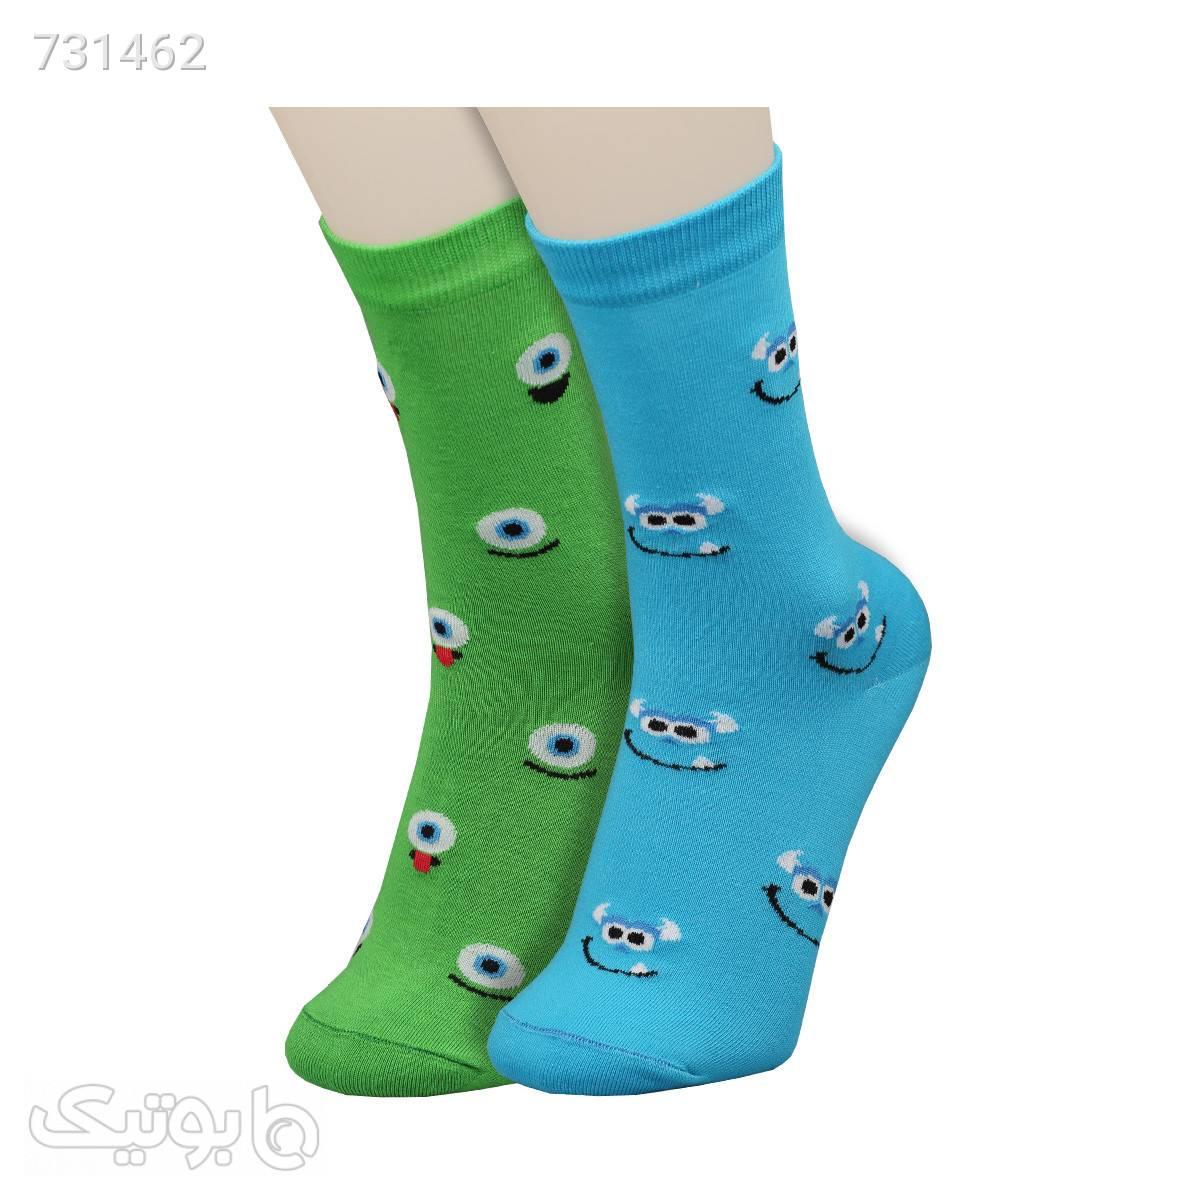 جوراب طرح Monsters زنانه ساق دار کدsow1471 آبی جوراب و پاپوش